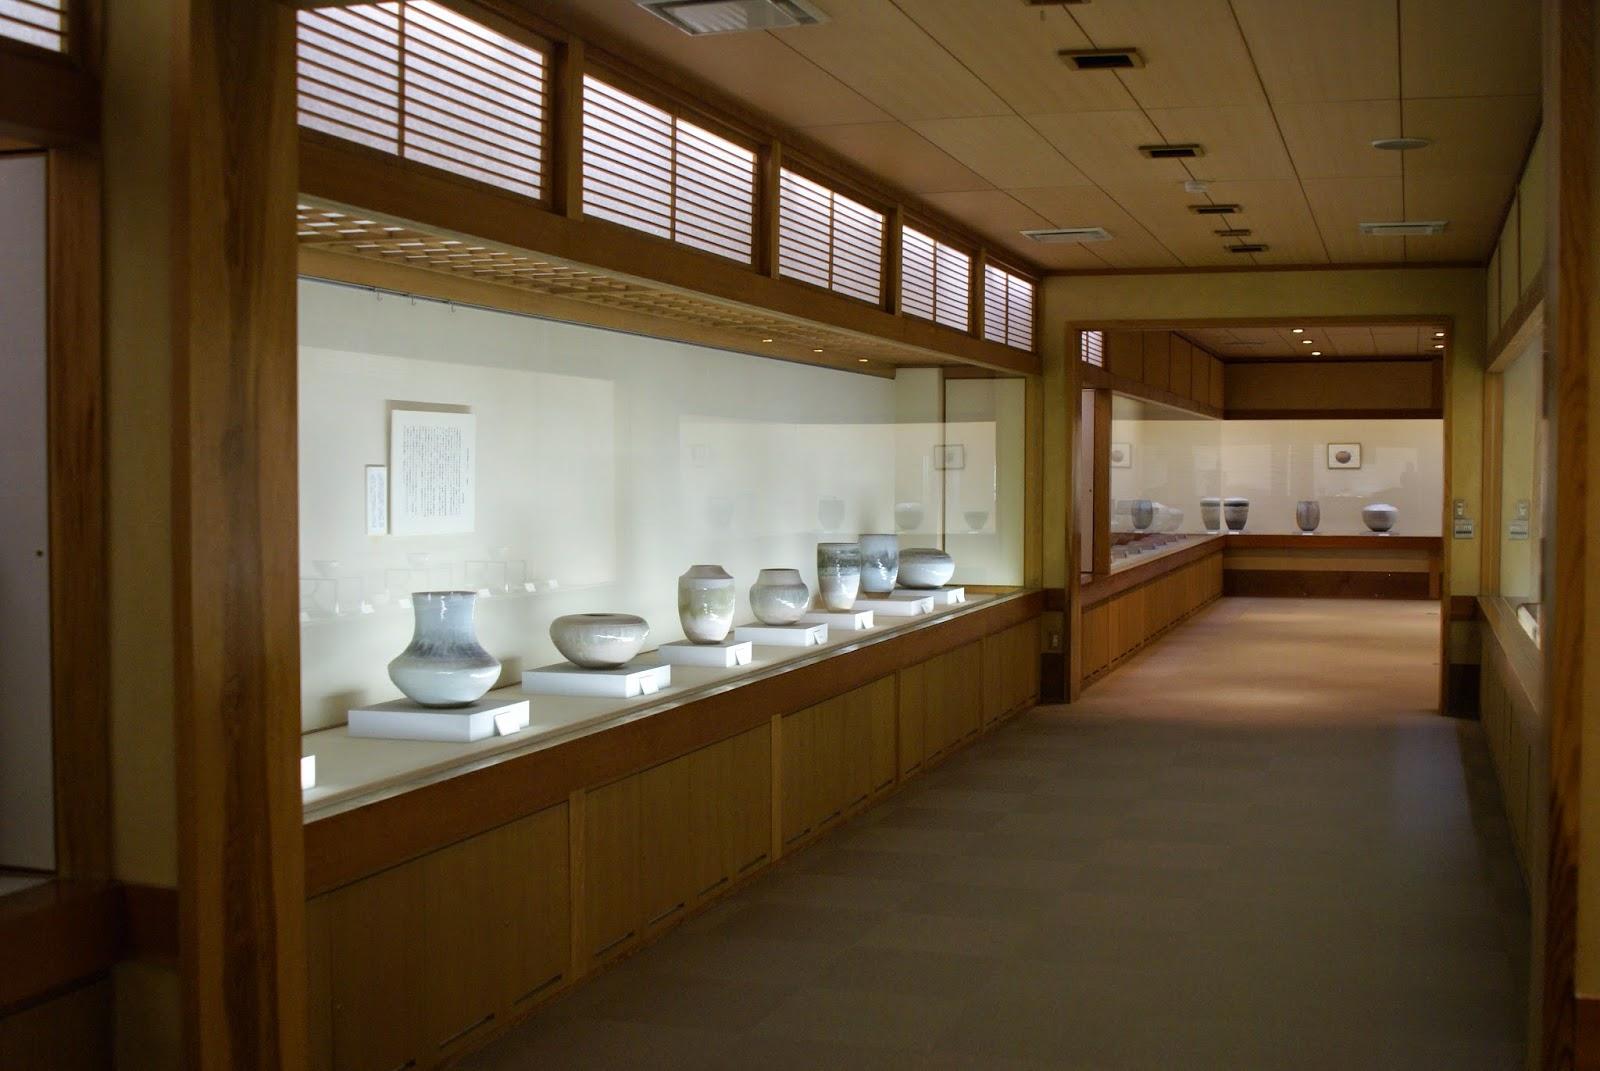 Yoshika Taibi Memorial Museum